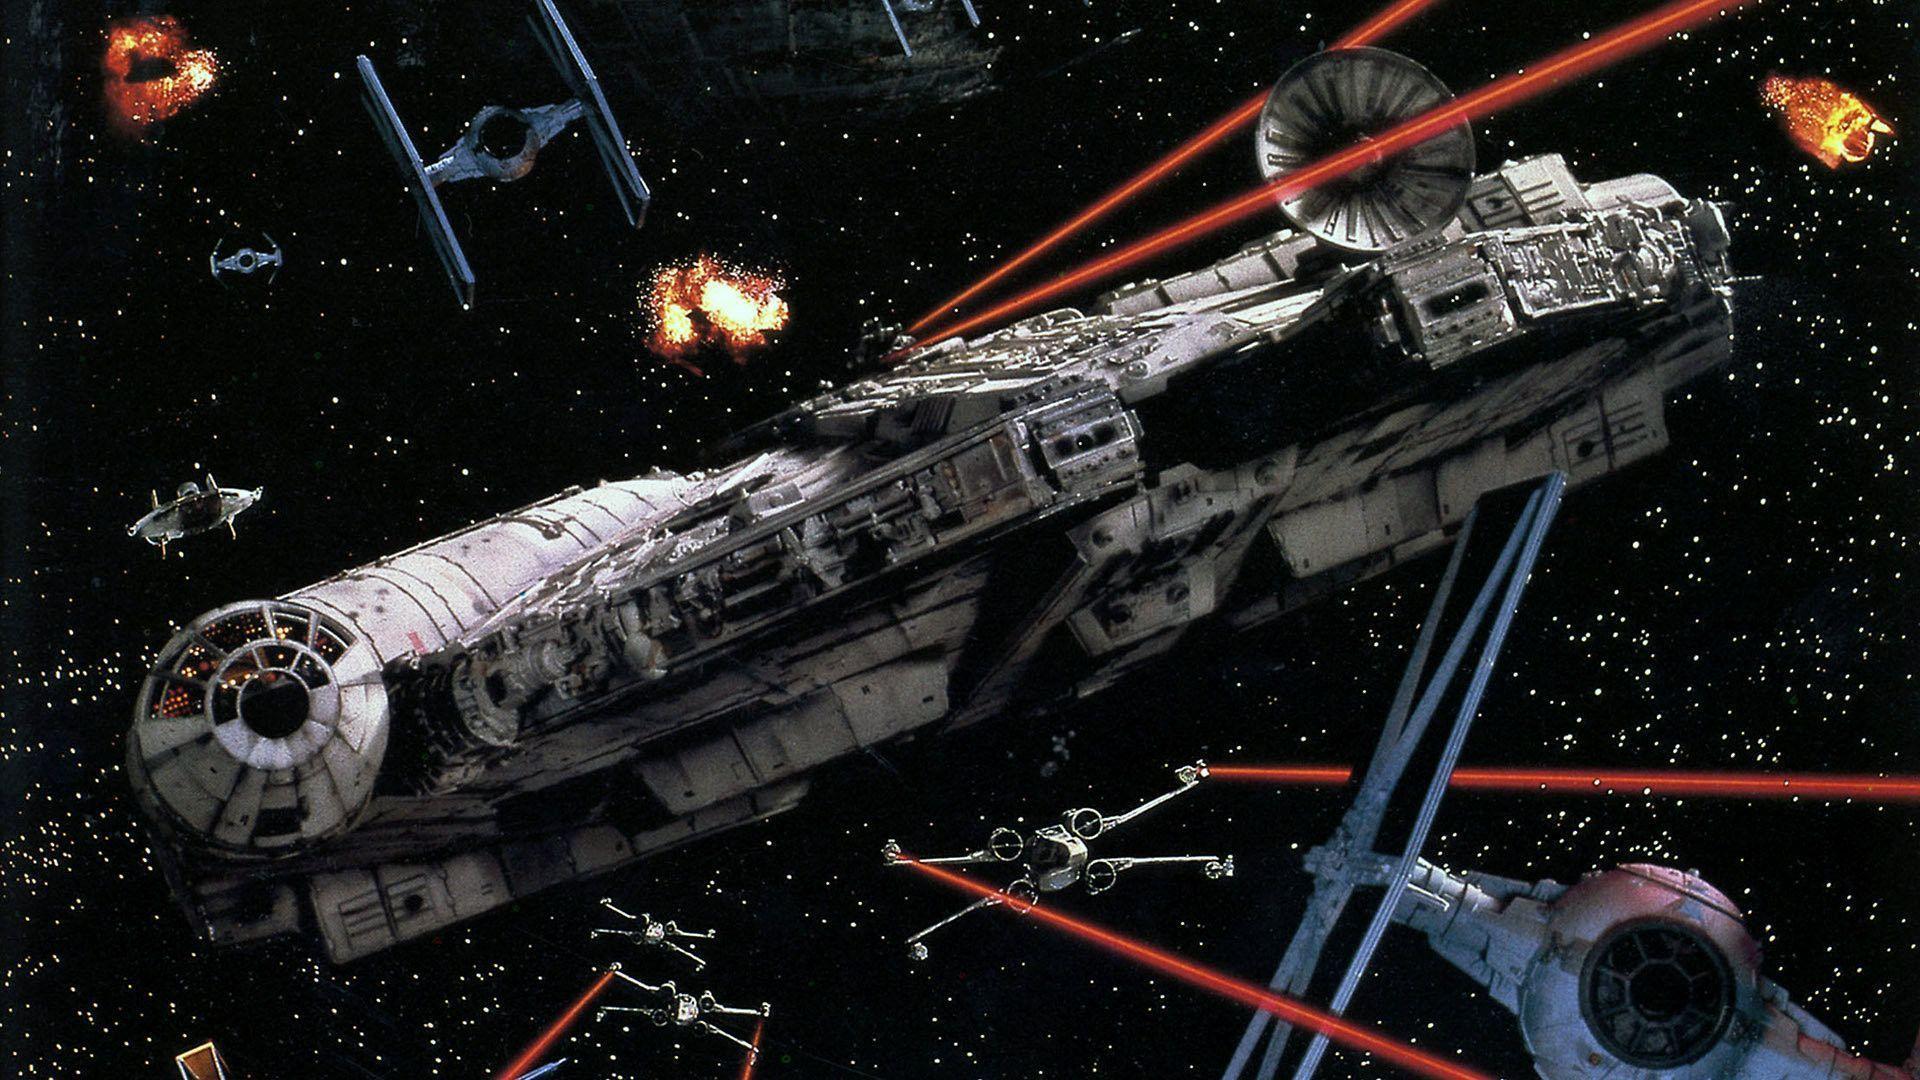 14 Star Wars Episode VI Return Of The Jedi Wallpapers